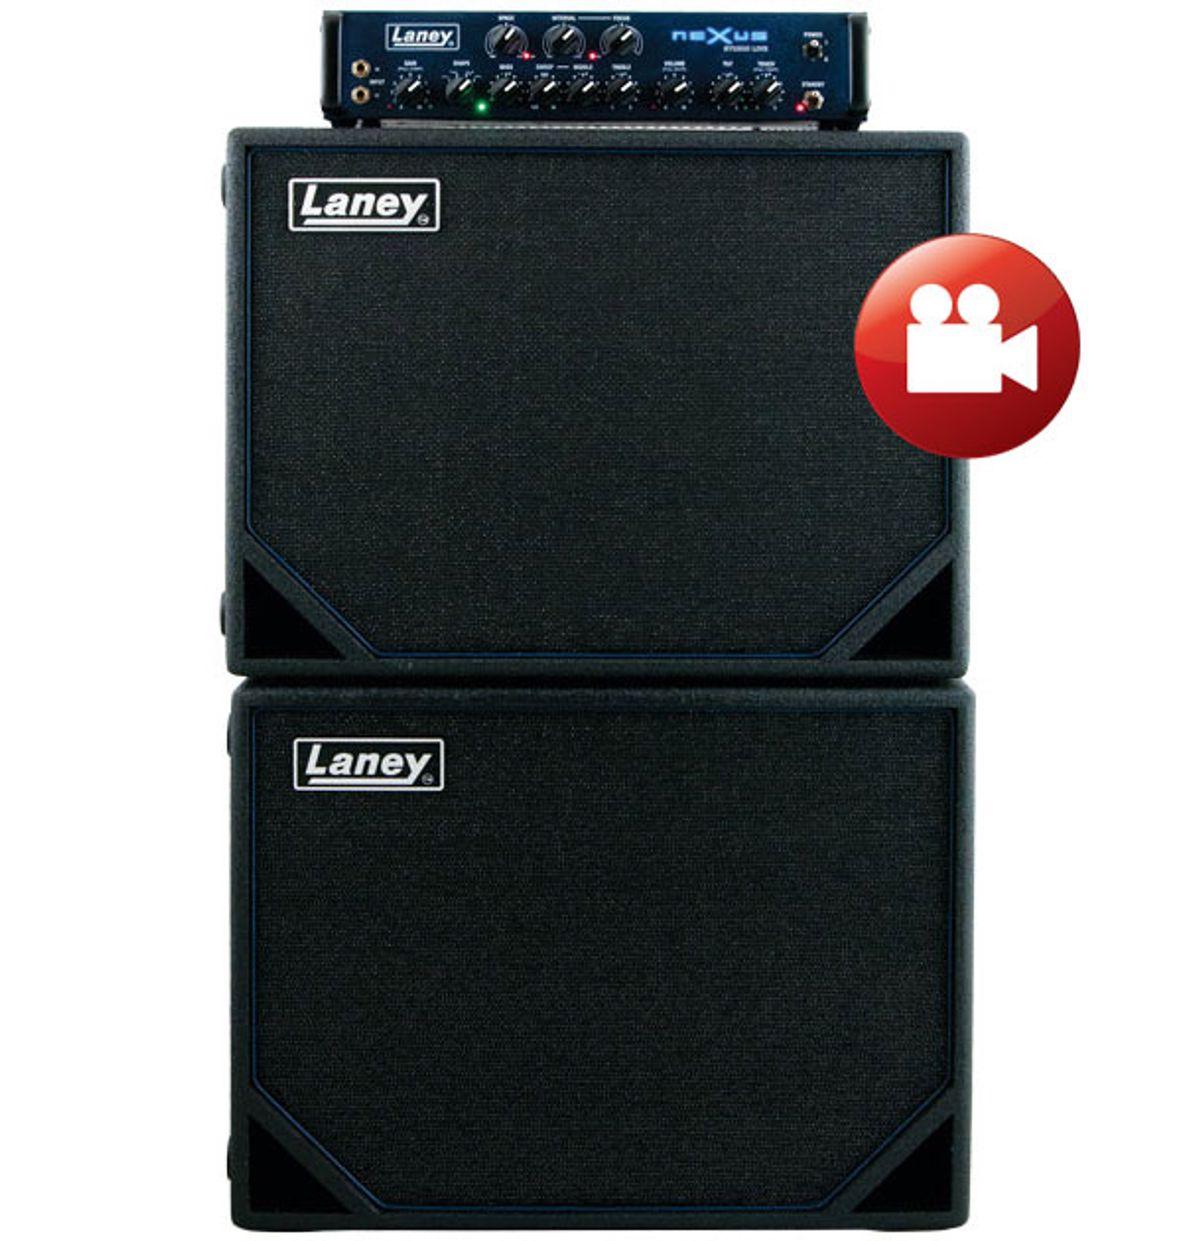 Laney Nexus Studio Live Head & Cabs Review